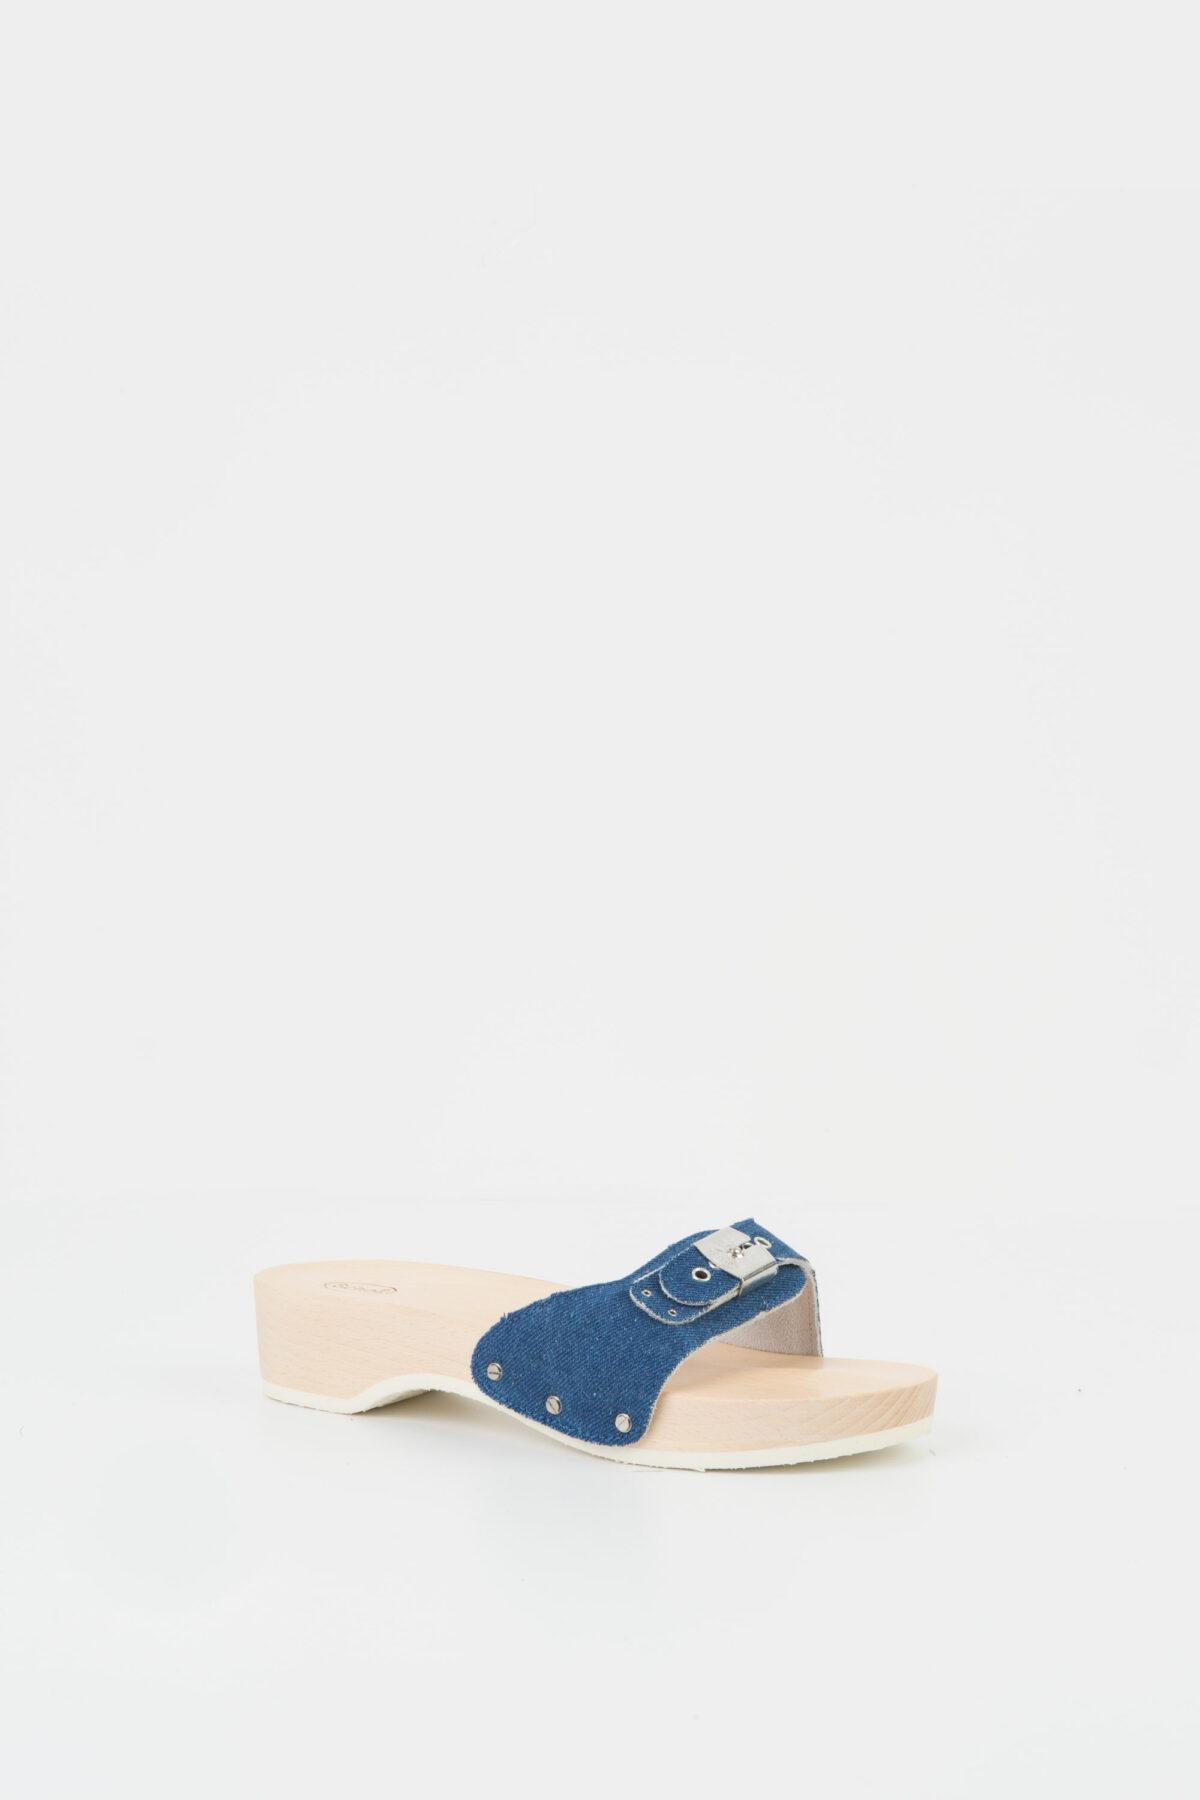 pescura-wooden-mule-blue-jeans-scholl-matchboxathens